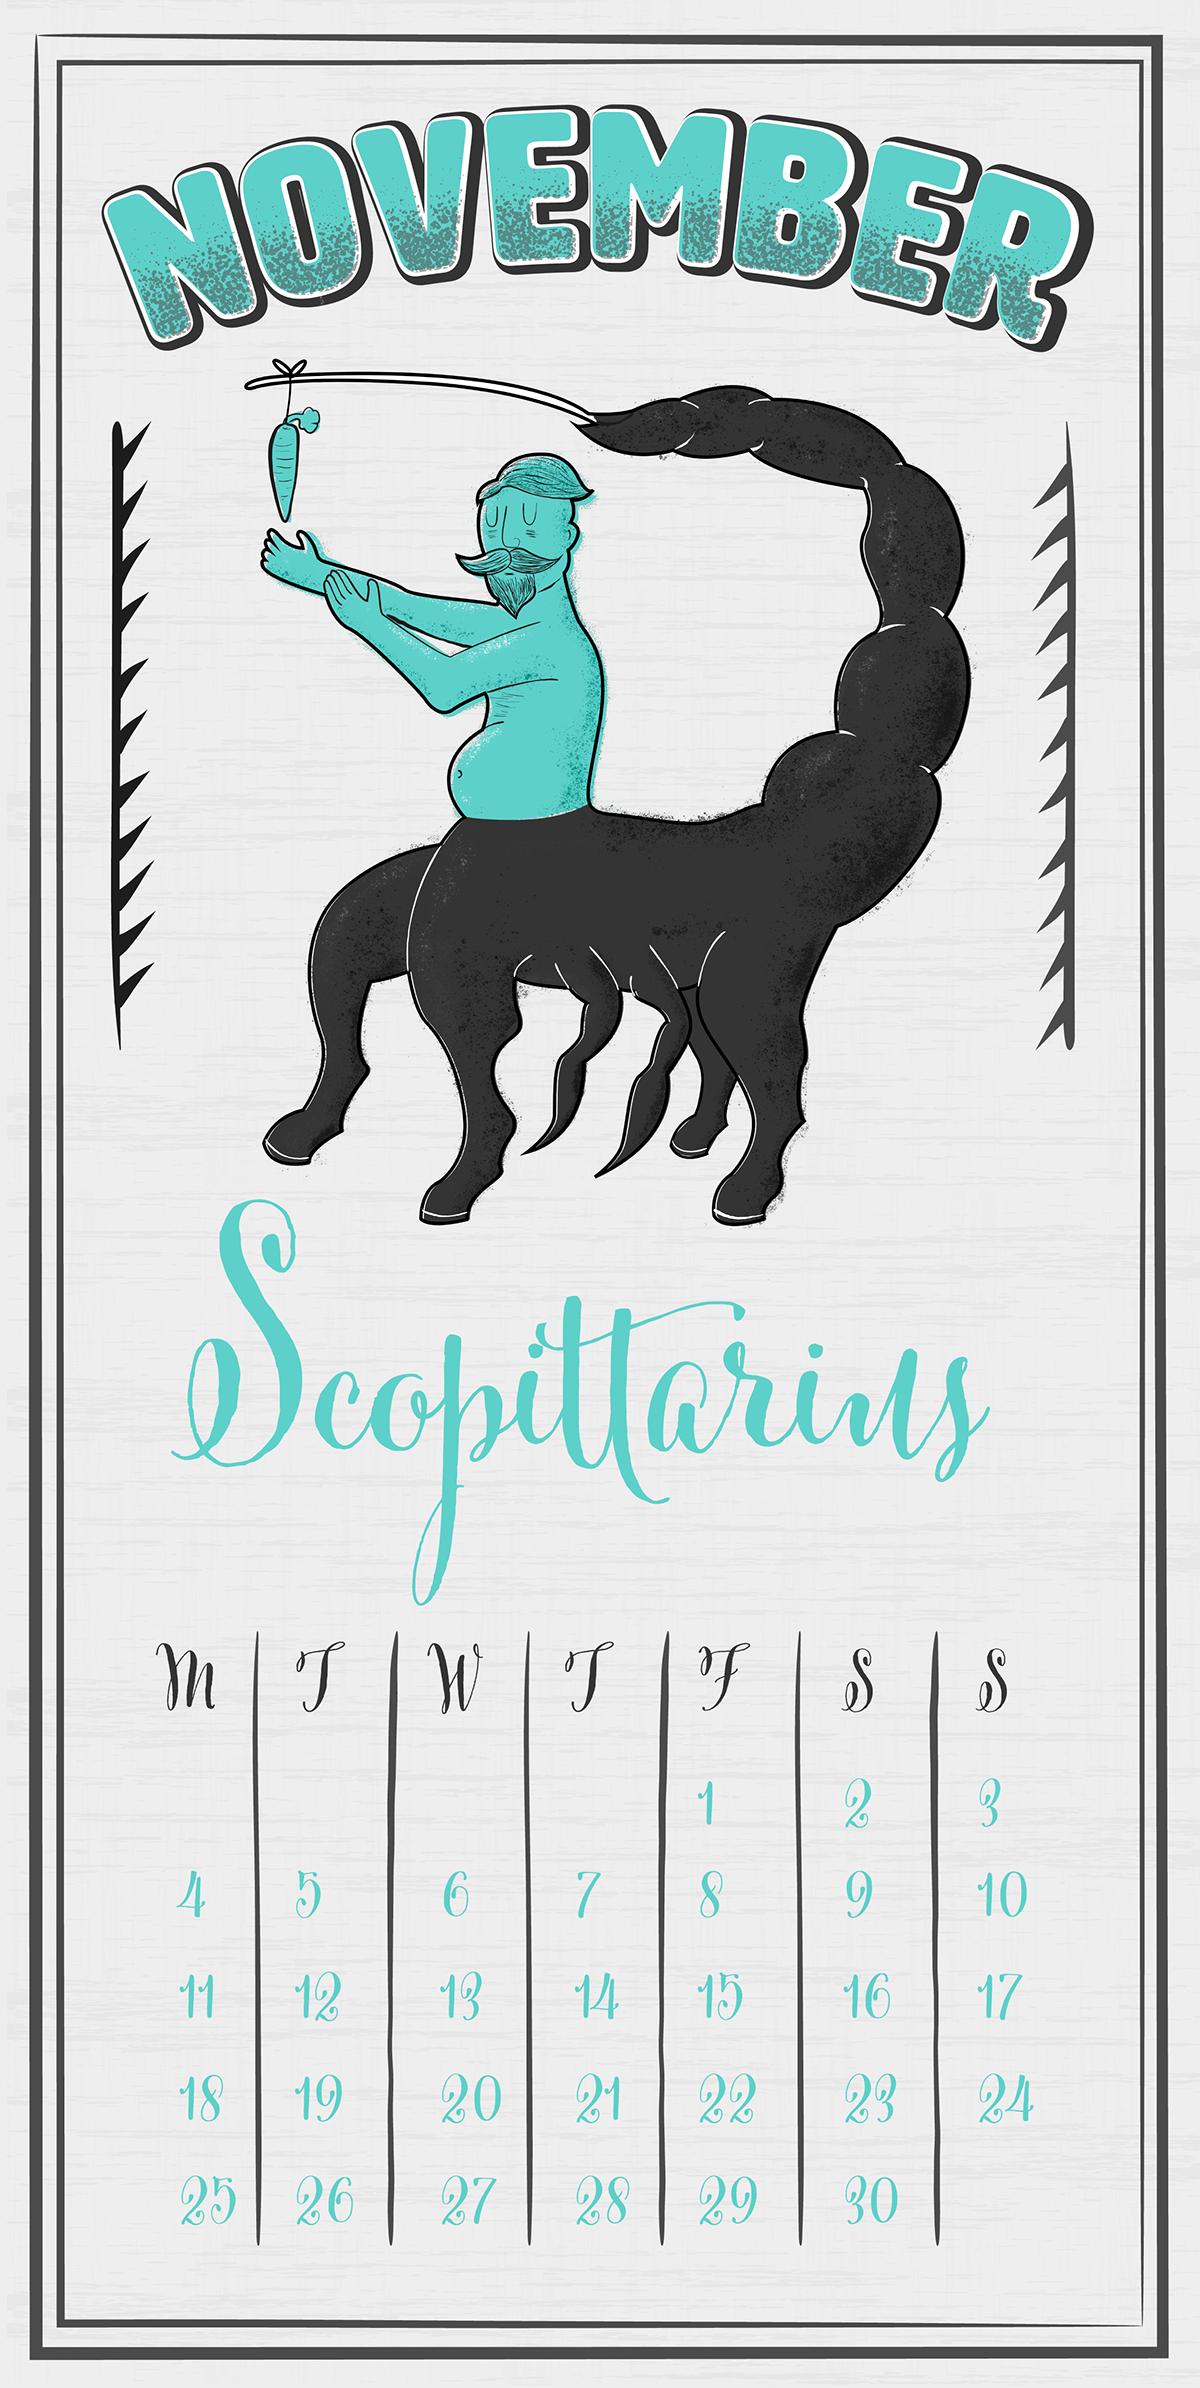 Scorpittarius clipart clip art freeuse stock Scorpittarius on Behance clip art freeuse stock